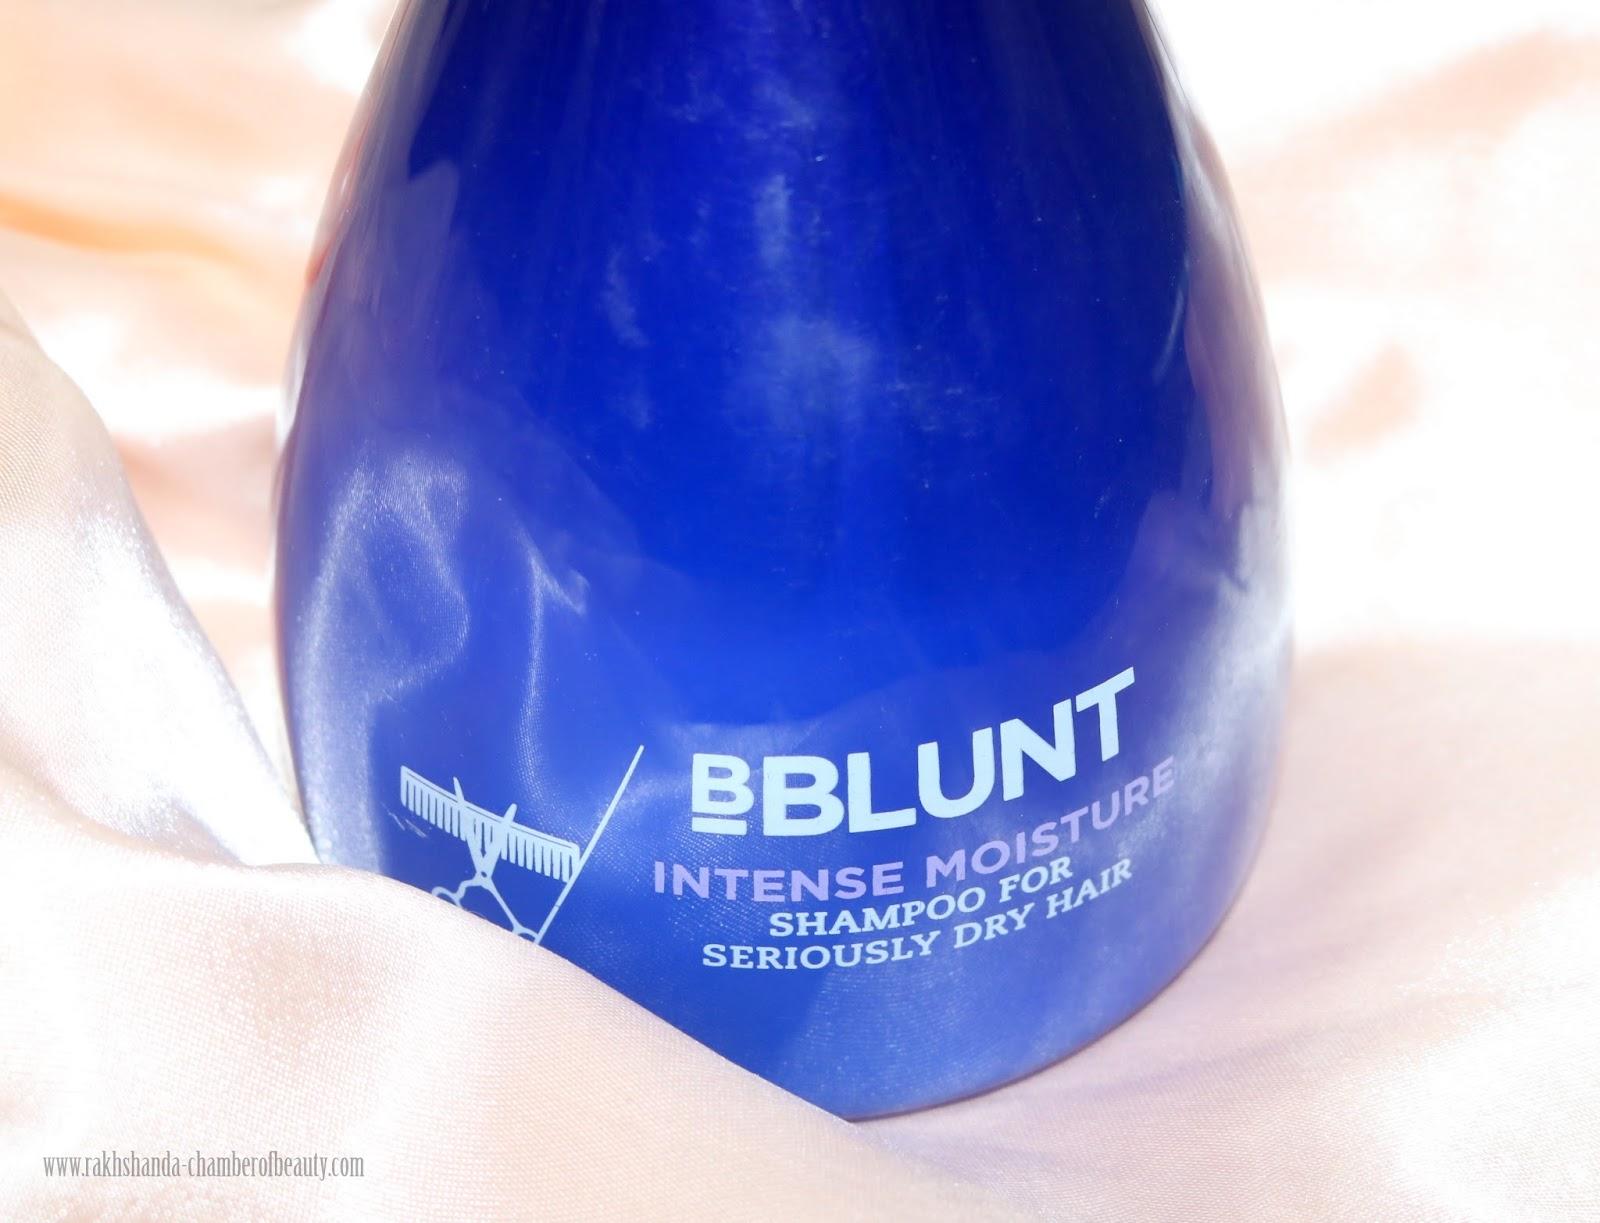 BBlunt, BBlunt Intense Moisture Shampoo,Indian beauty blogger, BBlunt Intense Moisture Shampoo Review & Price,